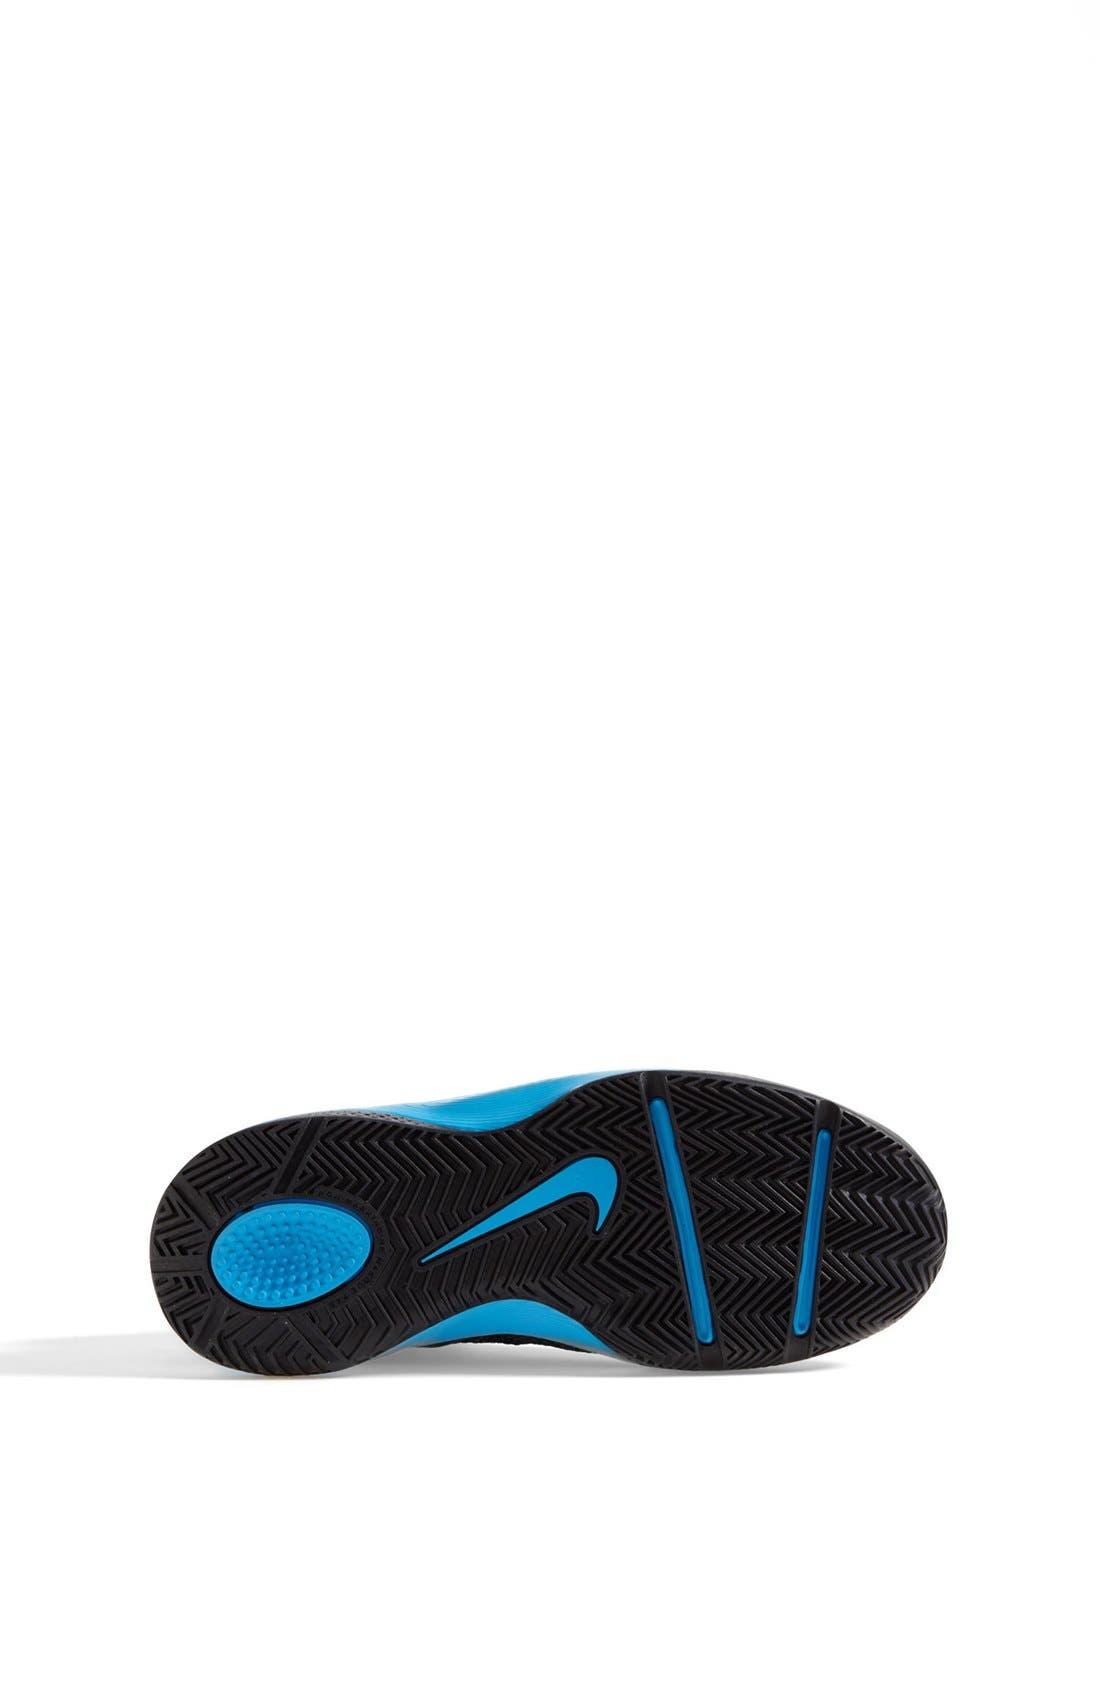 Alternate Image 4  - Nike 'Hyperfuse 2013' Basketball Shoe (Big Kid)